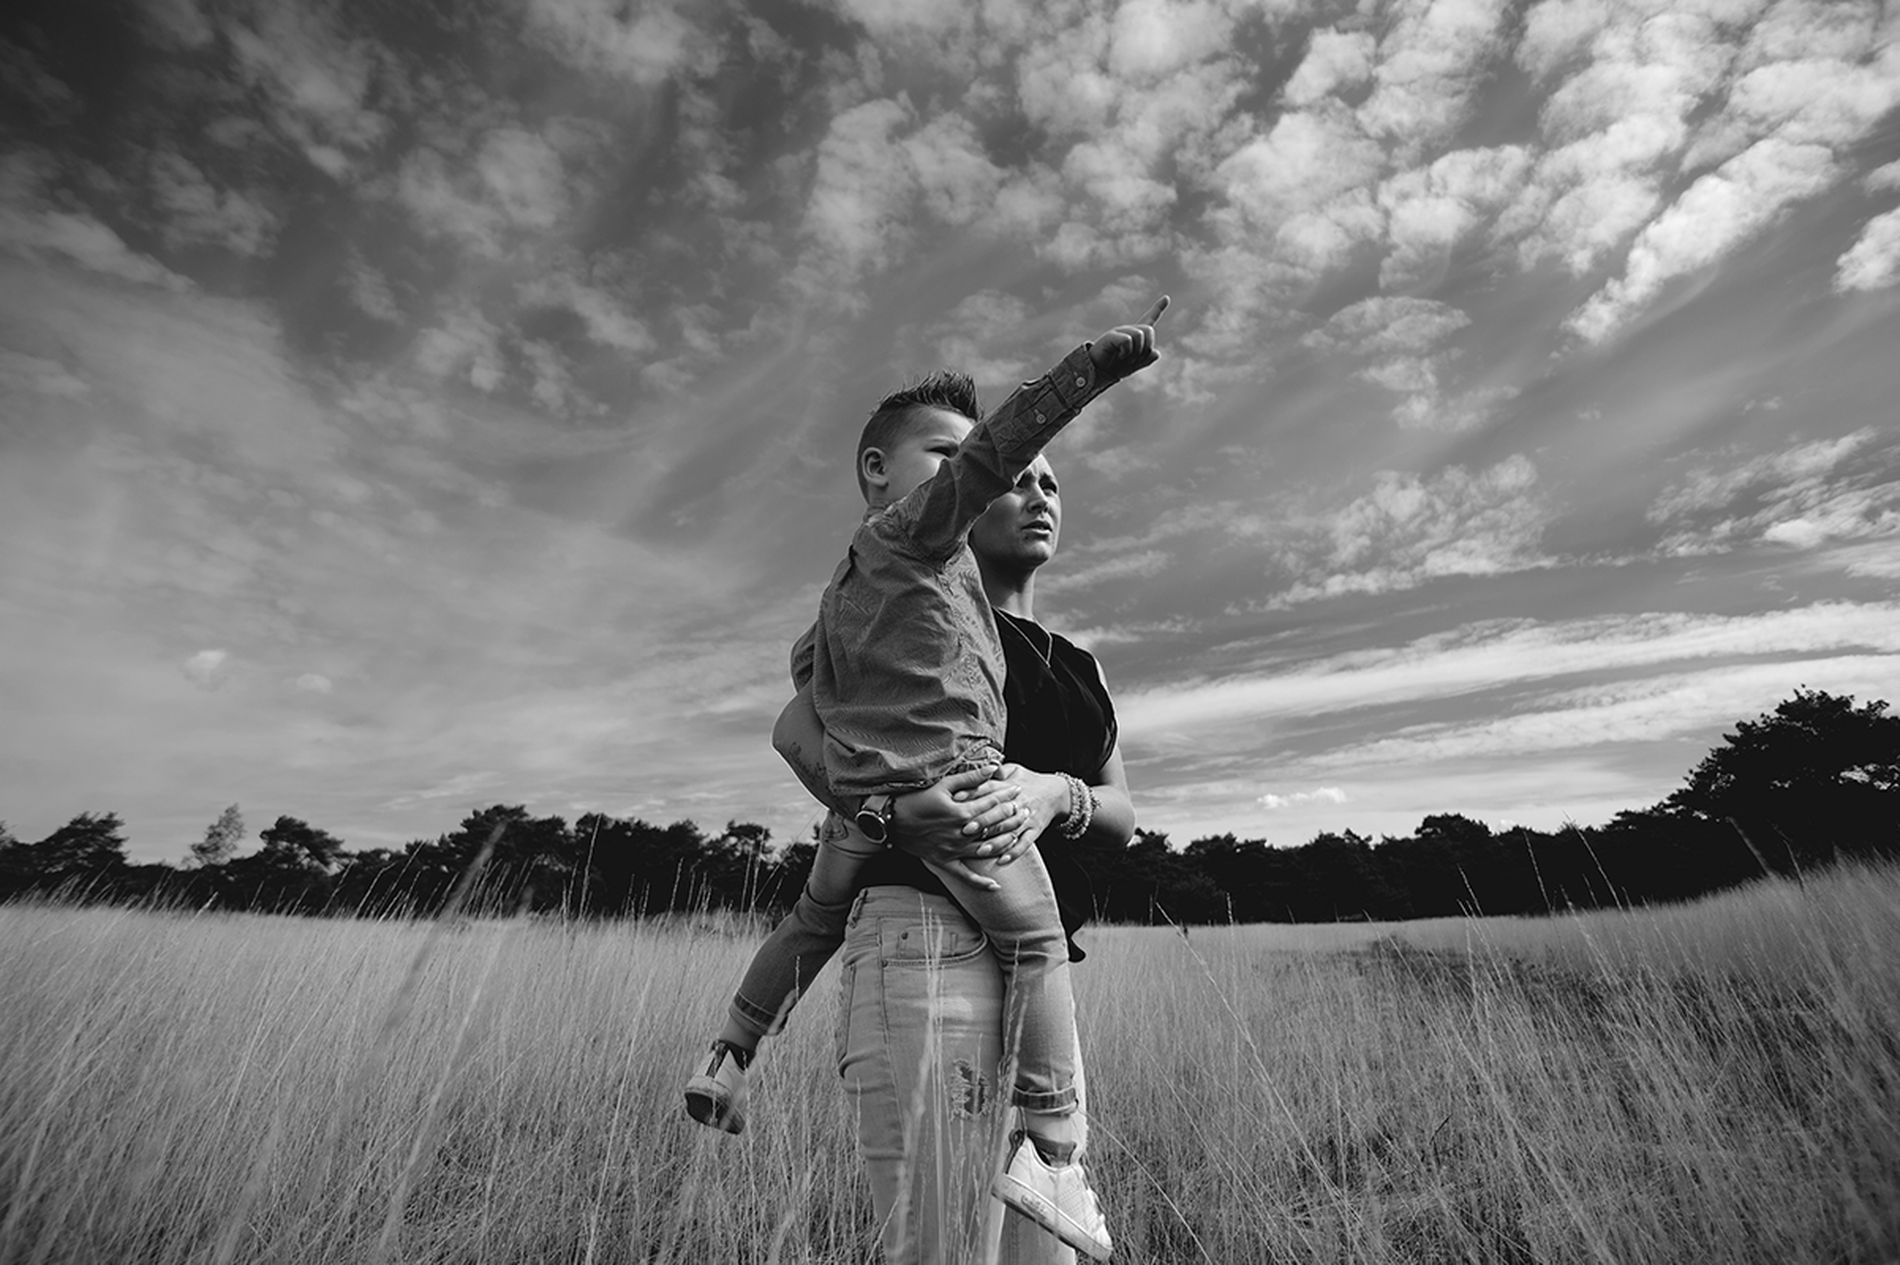 Bart-Boodts-4 MCP Actions Sponsored GuruShots Motherhood Photo Challenge Winners Contests